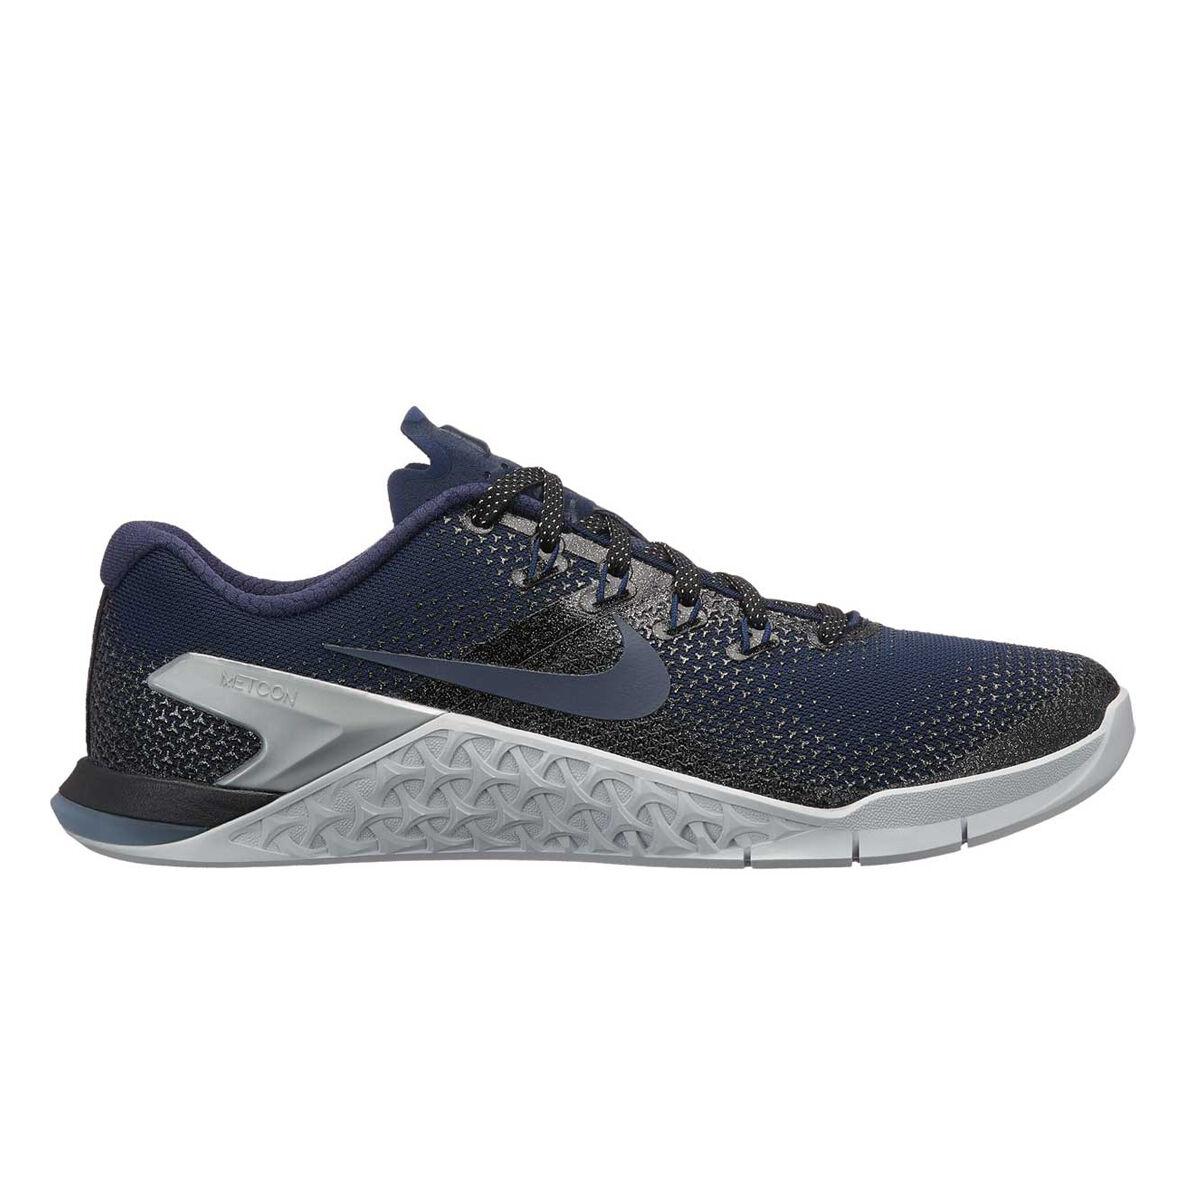 Nike Metcon 4 Metallic Womens Training Shoes